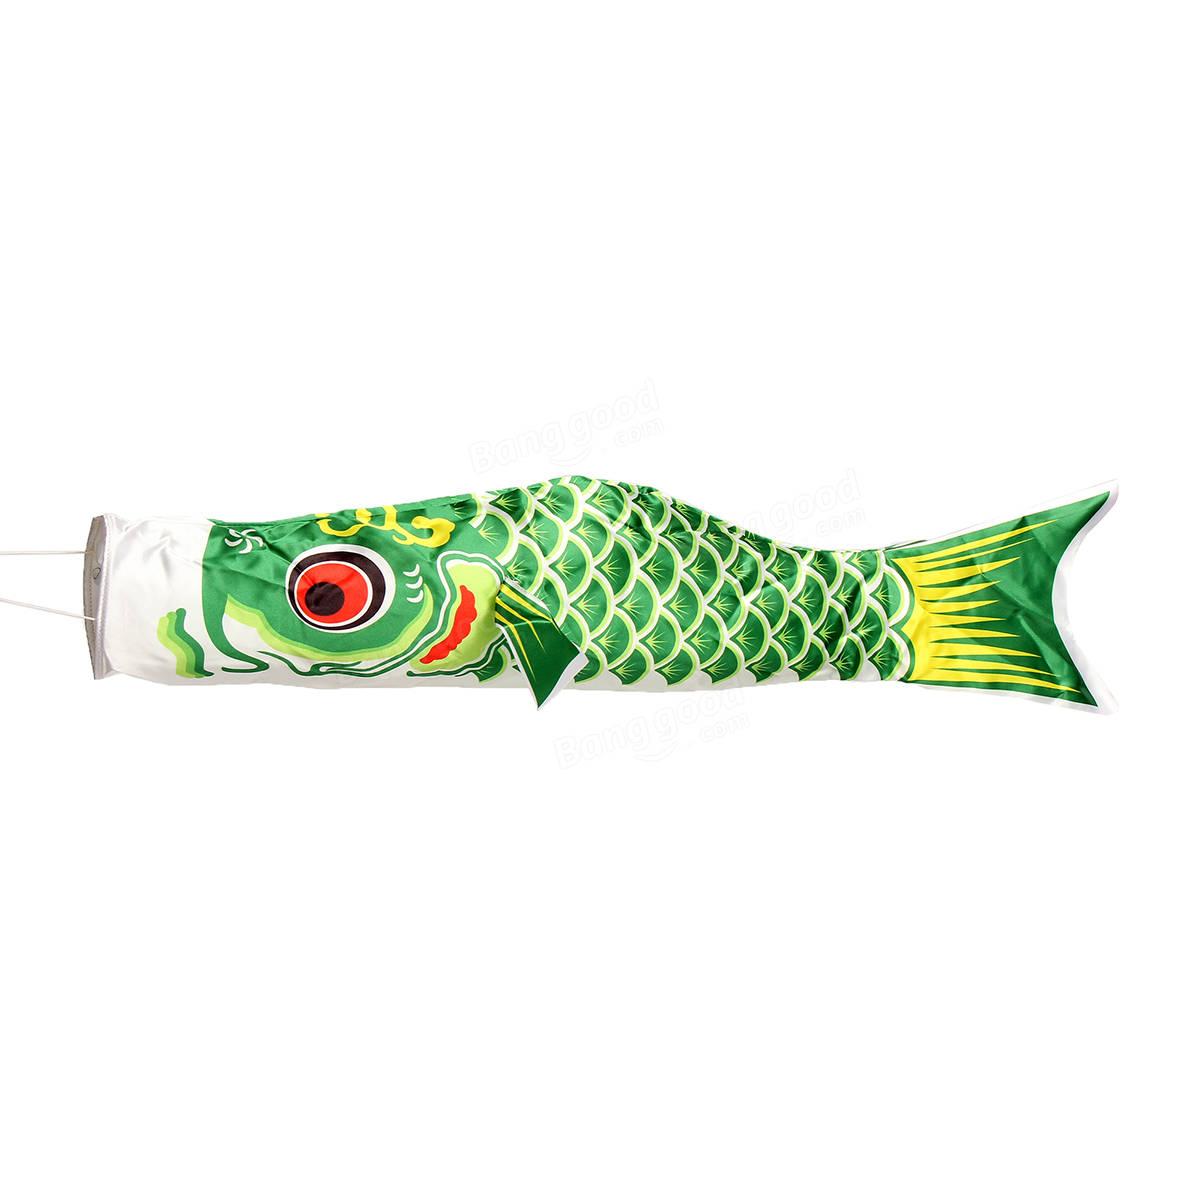 100cm koi nobori carp wind sock koinobori fish kite flag for Japanese fish flag